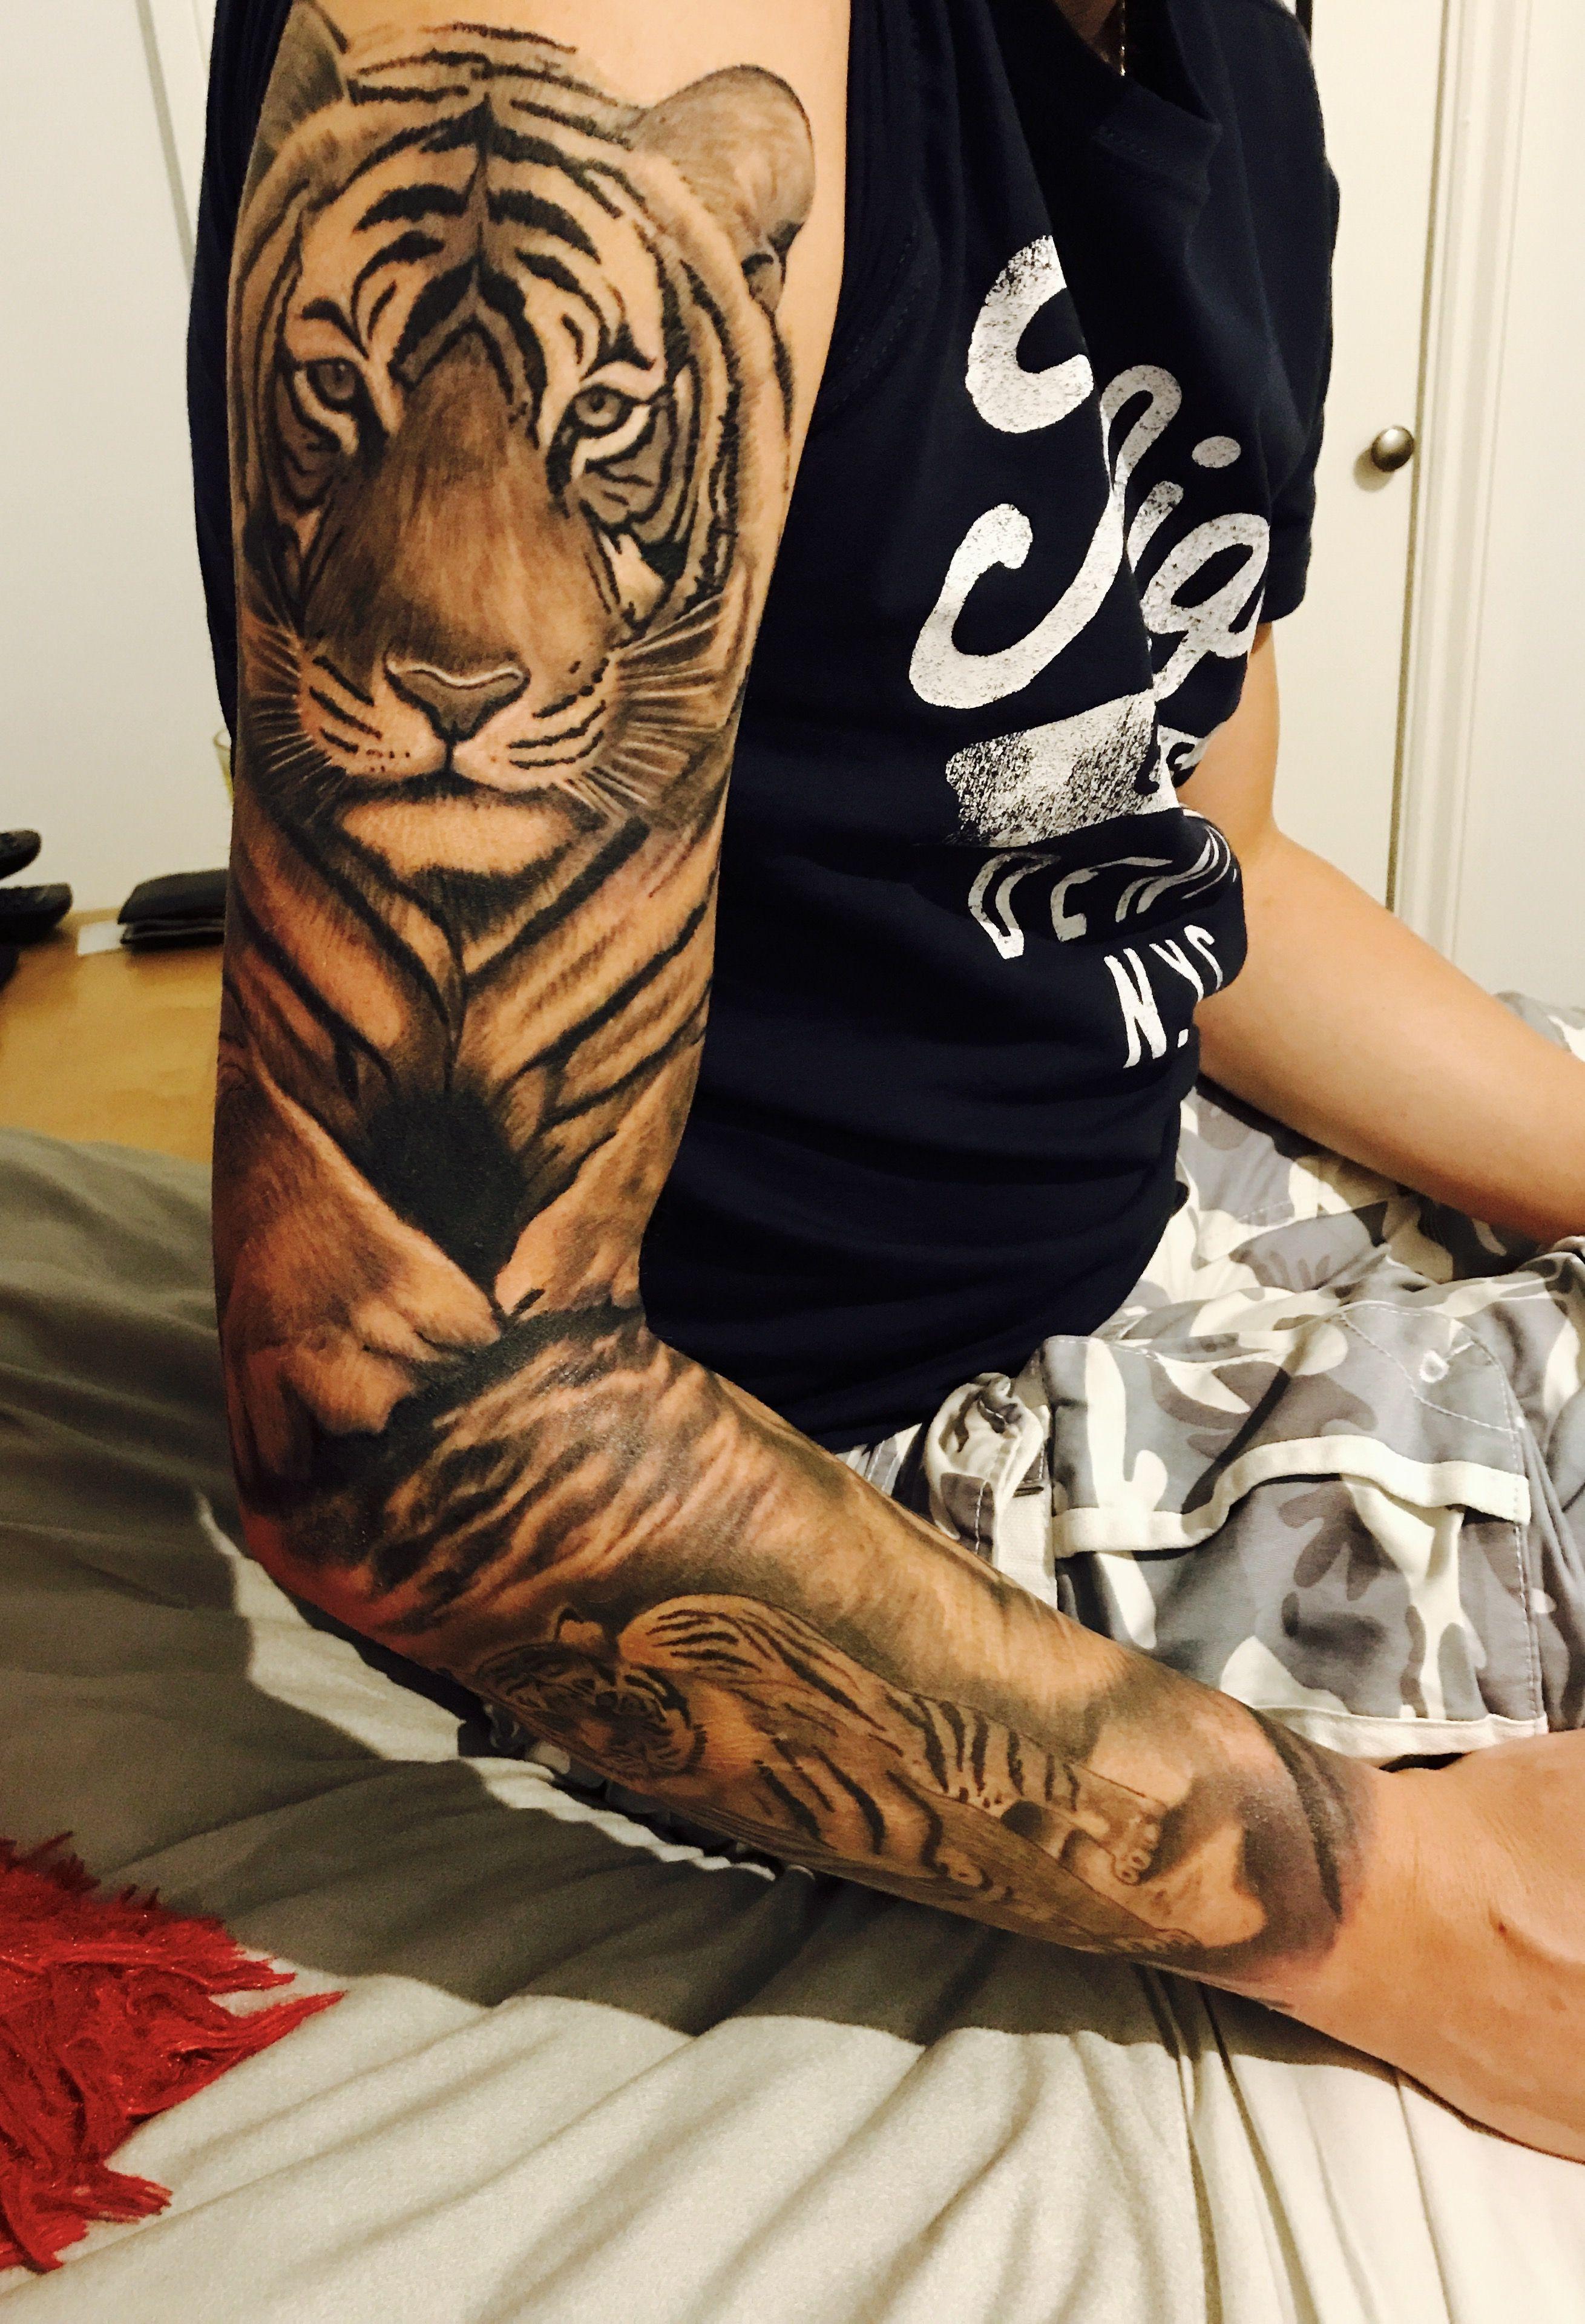 Pin De Silvia En Gracioso Mangas Tatuajes Tatuajes Y Gatos